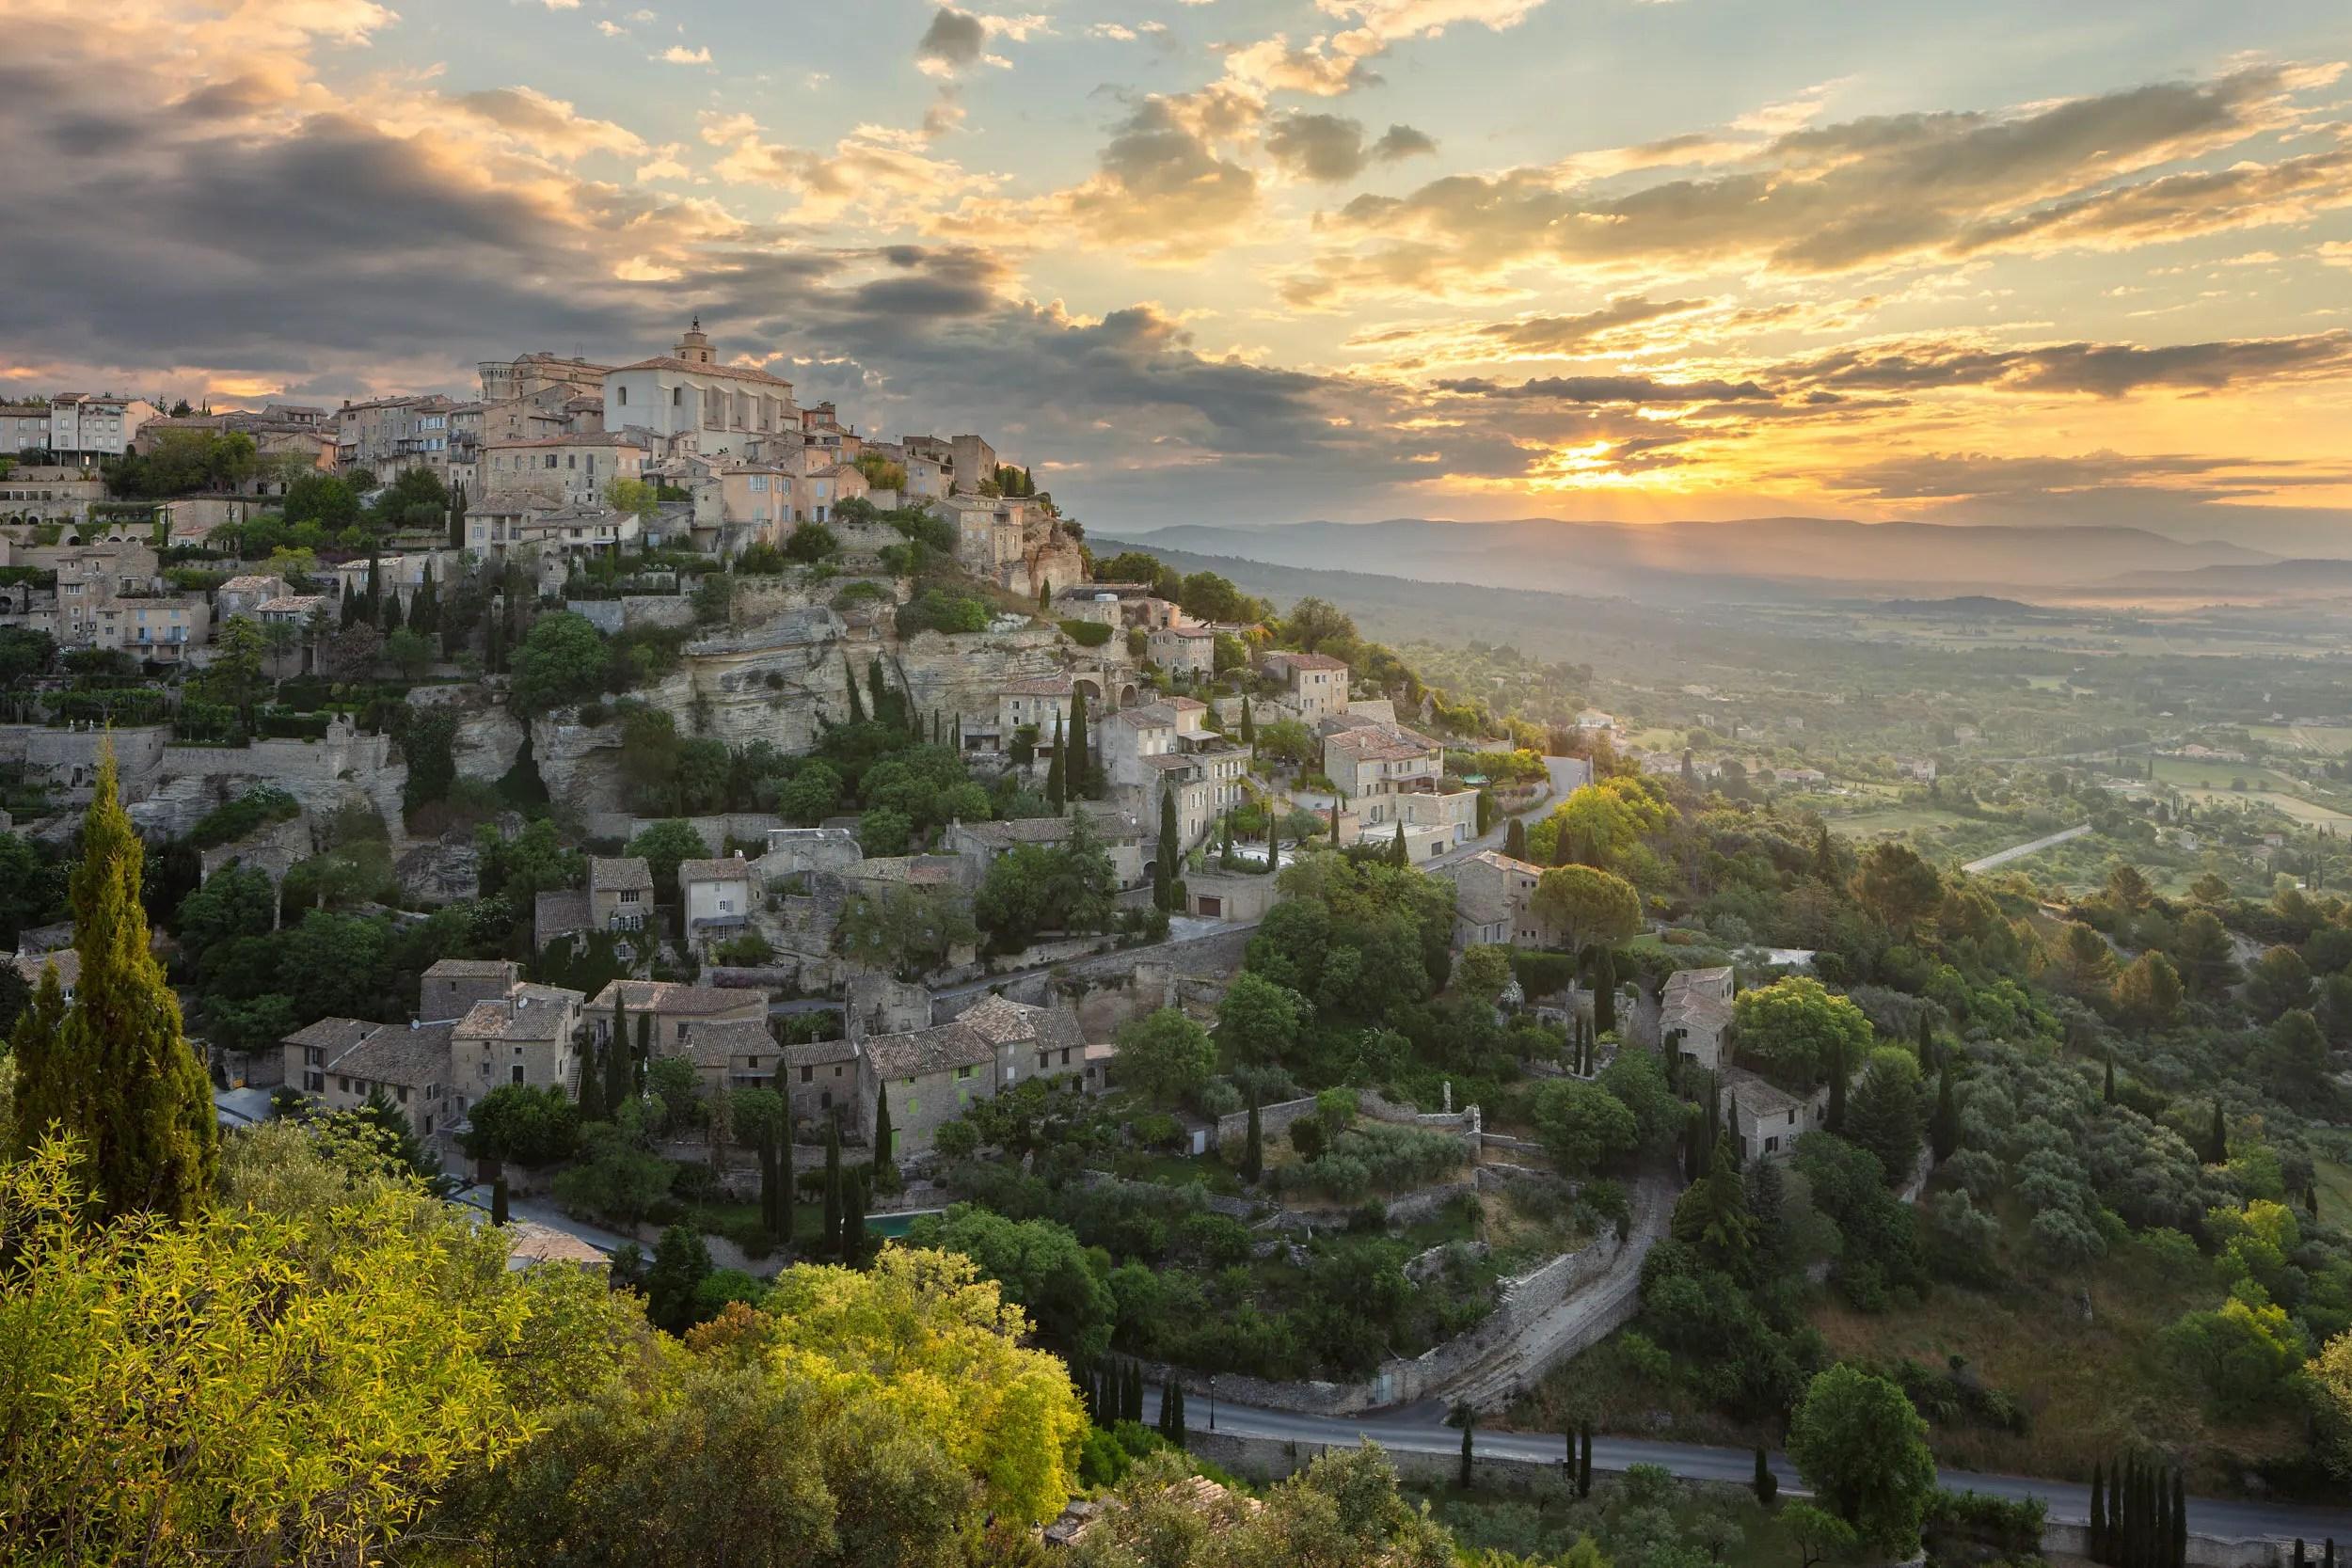 Gordes, Provence-Alpes-Côte d'Azur - France.